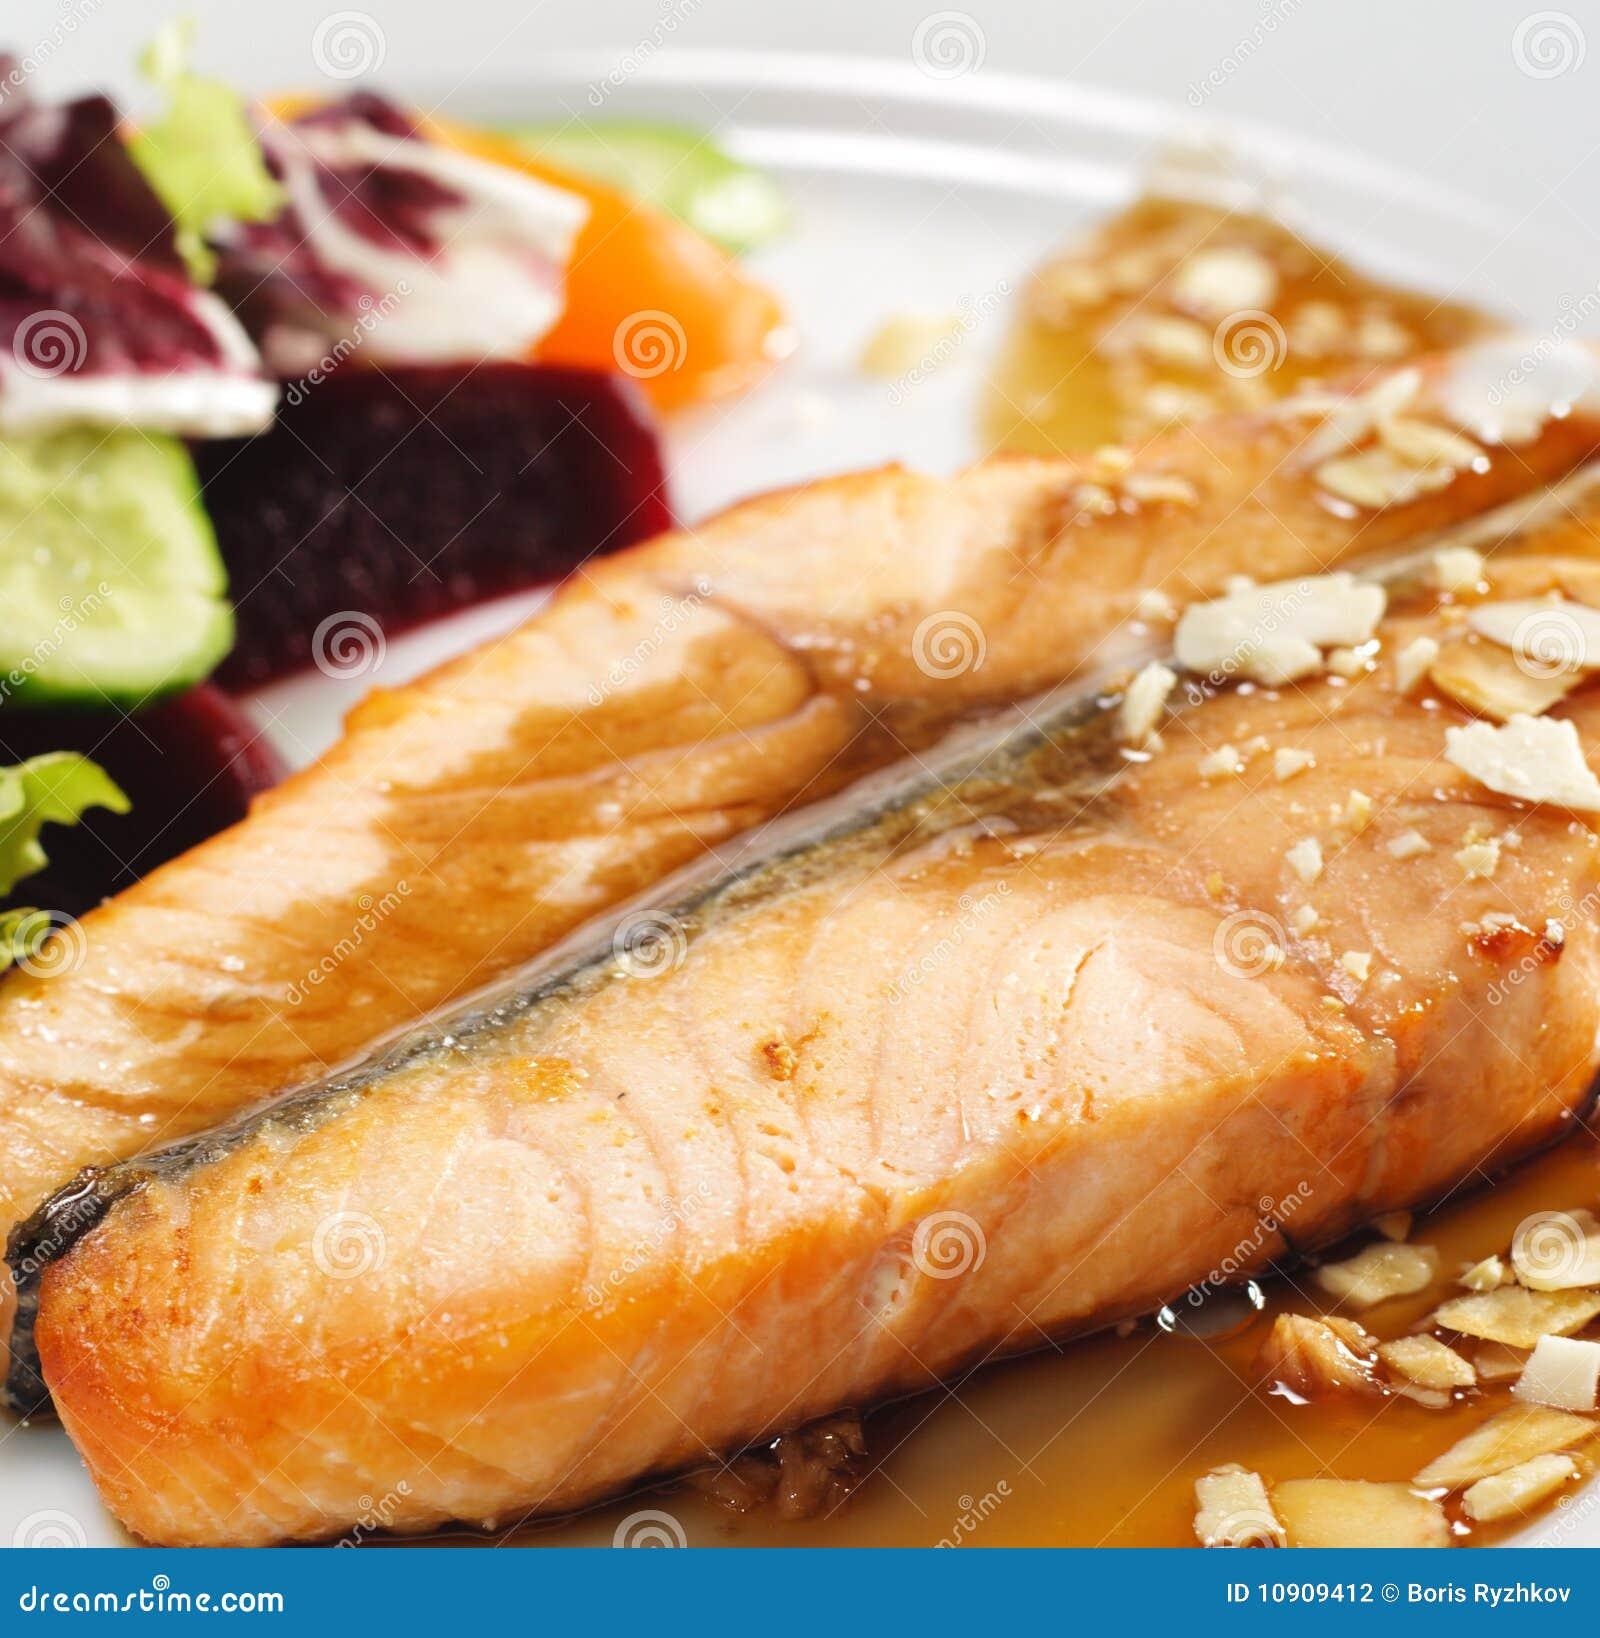 Hot Fish Dishes - Salmon Steak with Narsharab Sauce and Fresh Salad ...